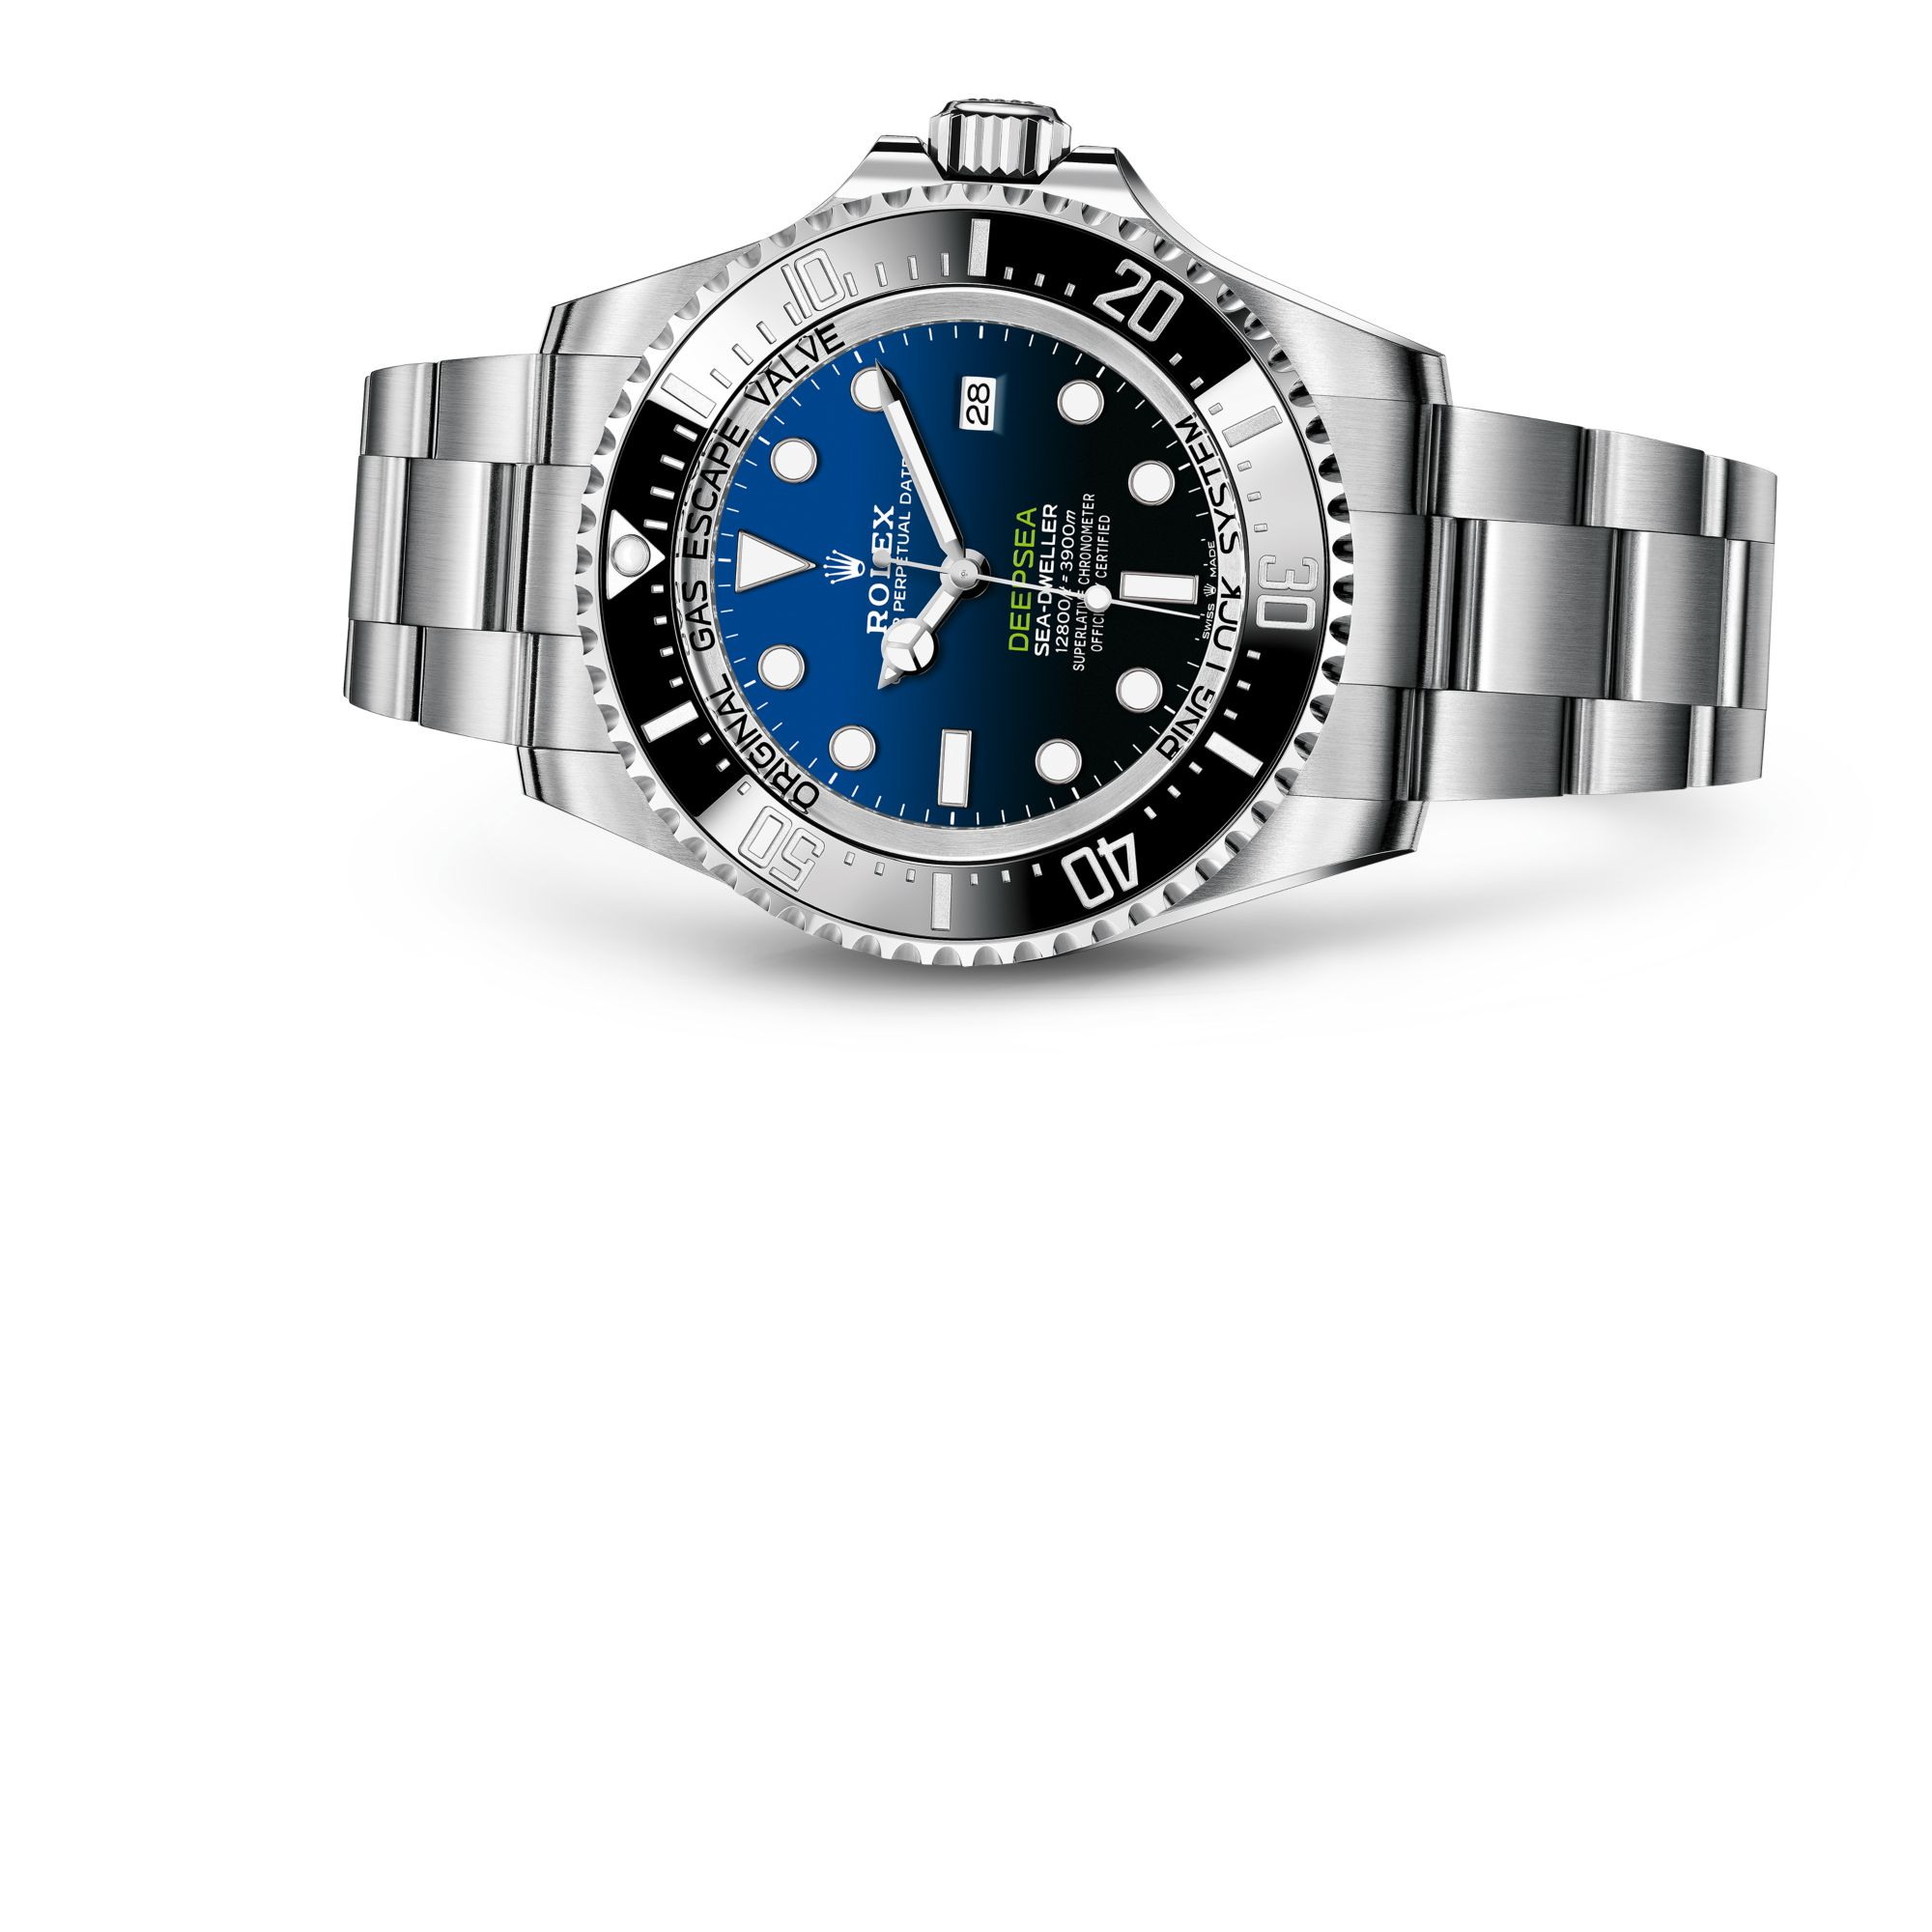 Rolex رولكس ديب سي بمينا ديبلو الأزرق M126660-0002